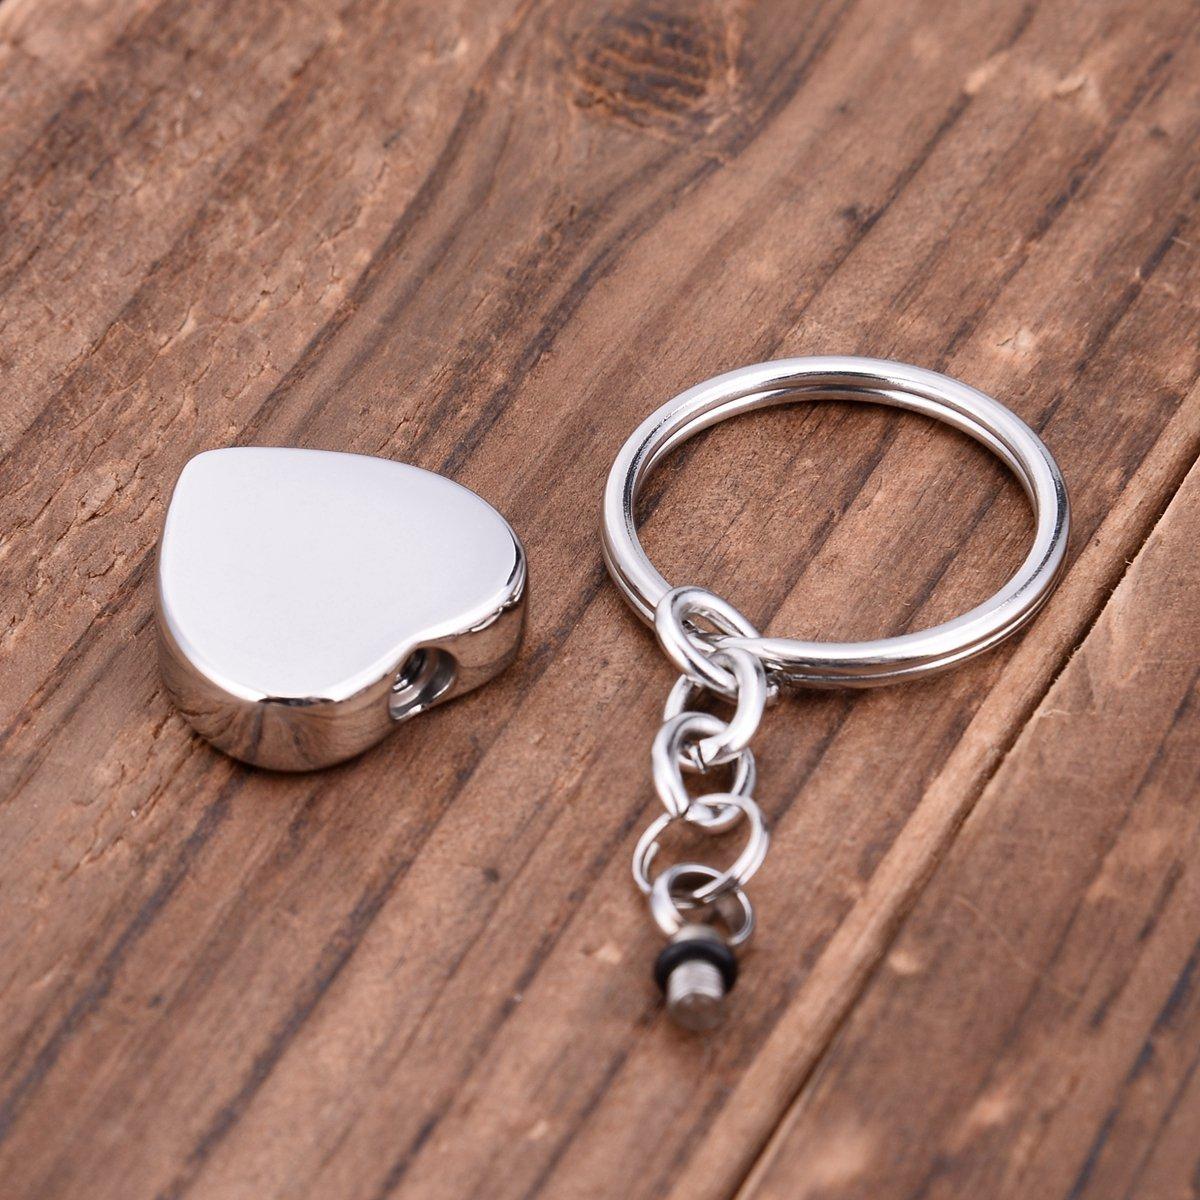 My Friend Series Heart Cremation Urn Keychain Keepsake Stainless Steel Memorial Ashes Keyring